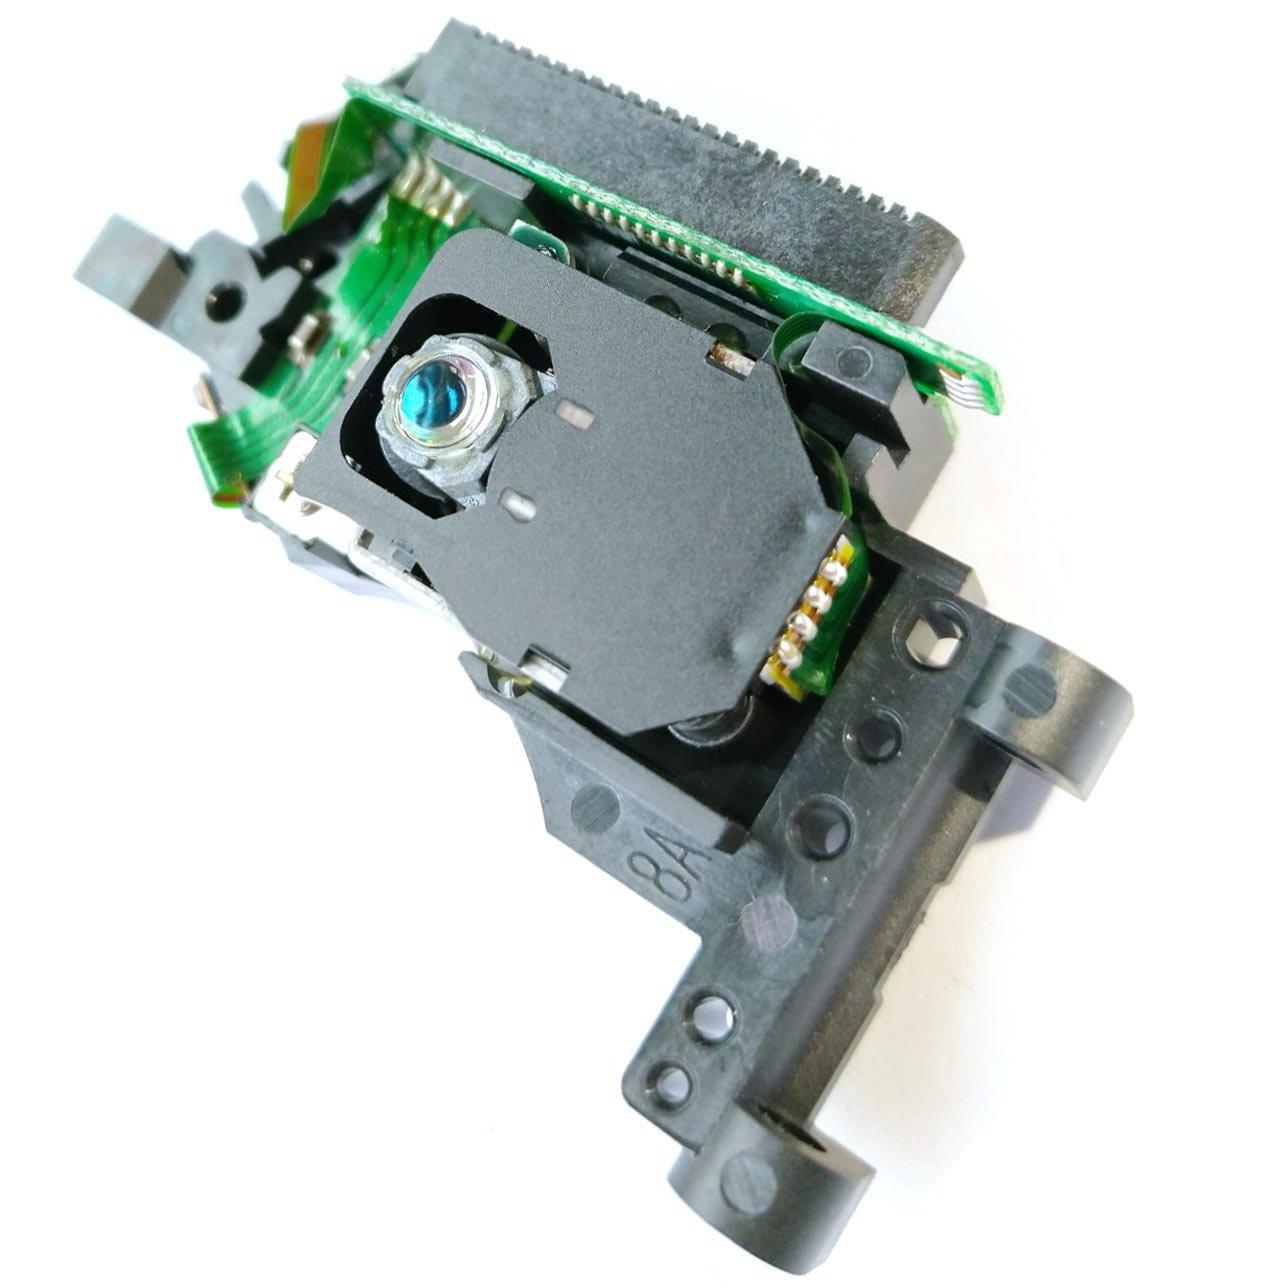 Original SACD Optical Pickup for CH D1 SACD Laser Lens